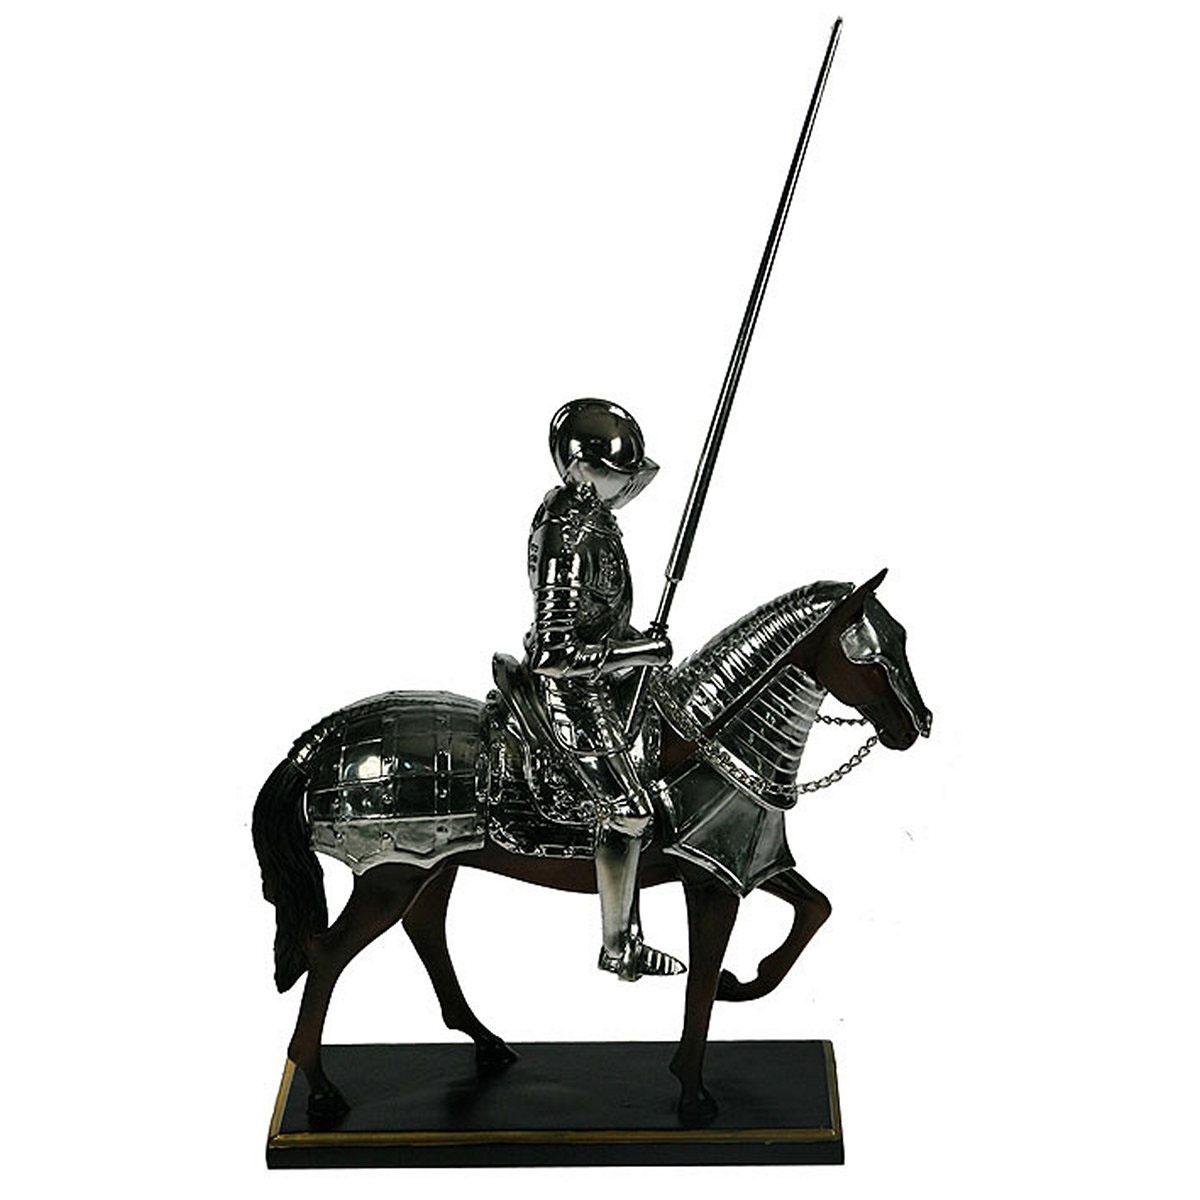 Статуэтка Русские Подарки Рыцарь, 30 х 12 х 35 см статуэтка русские подарки мисс утонченность 12 х 10 х 34 см